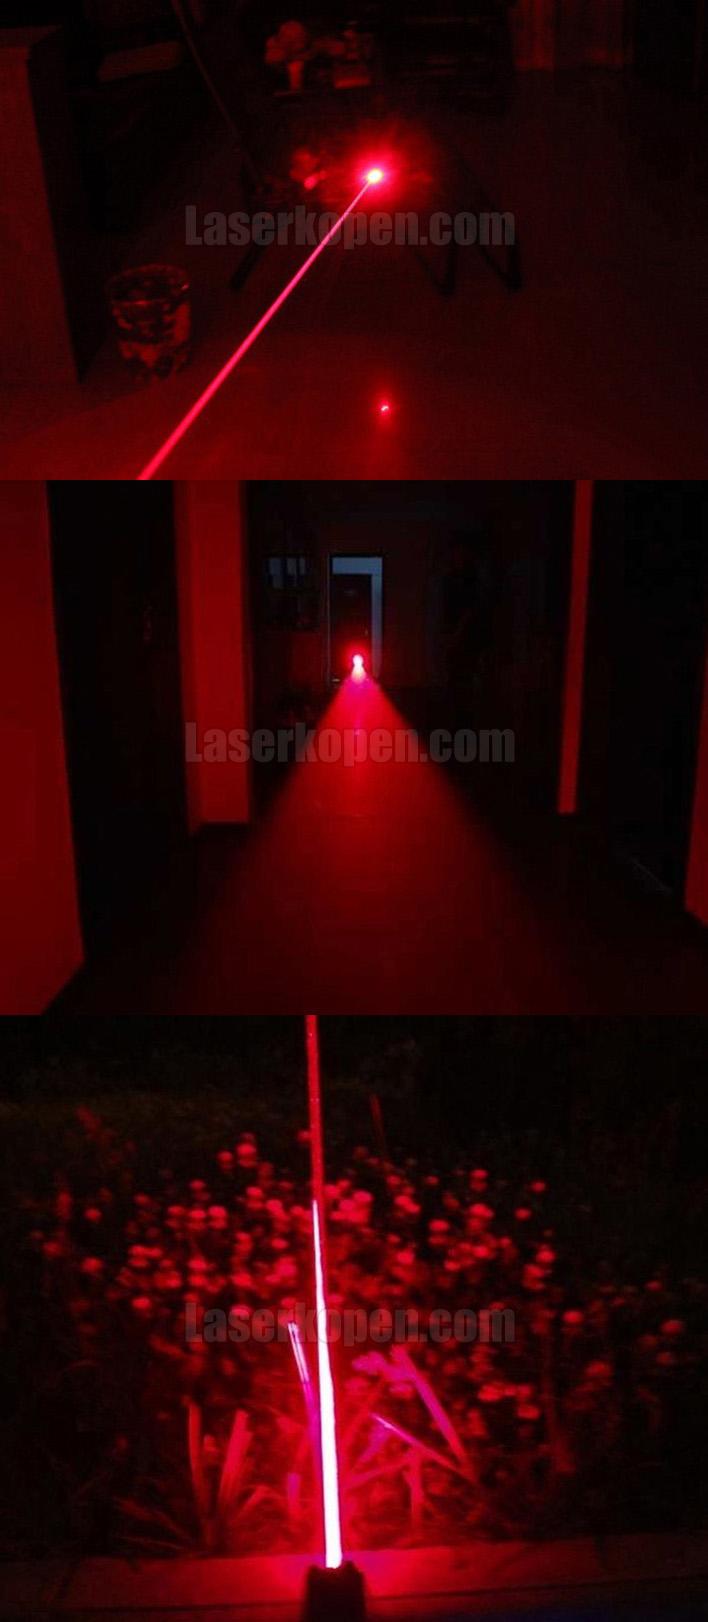 laserpen 1000mW